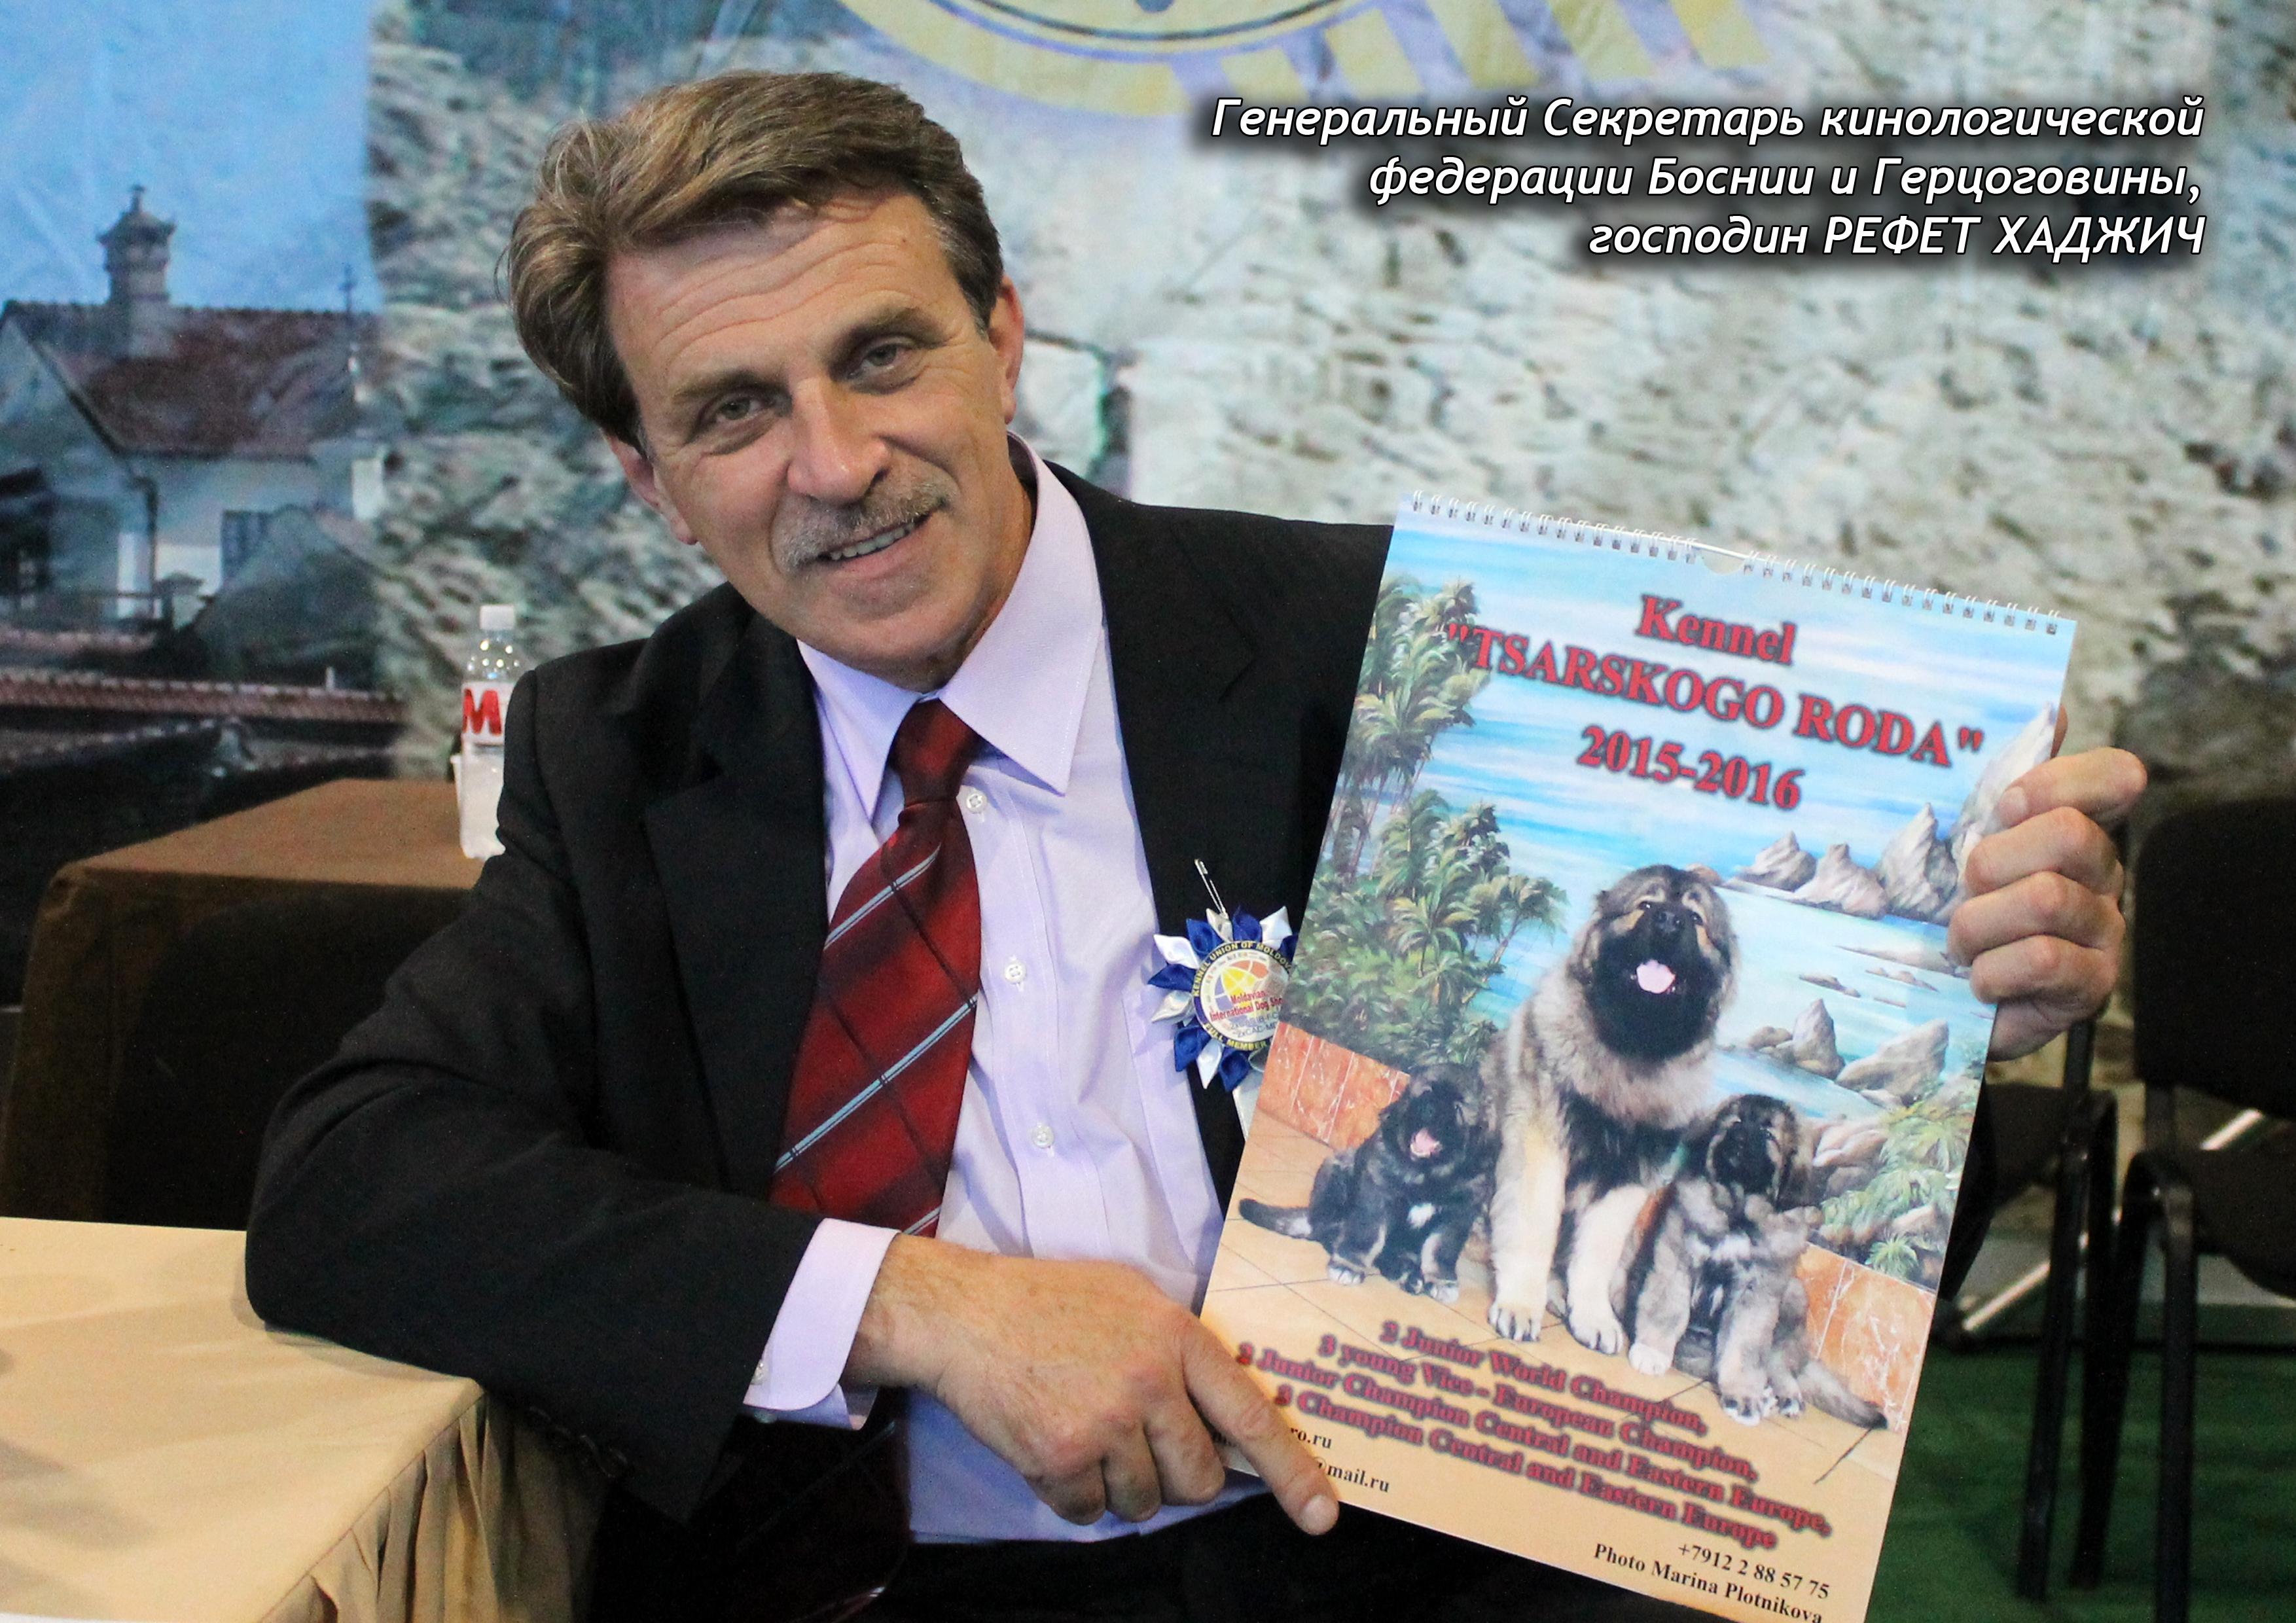 General`ny`i` Sekretar` kinologicheskoi` federatcii Bosnii i Gertcogoviny`, gos. REFET HADZHICh